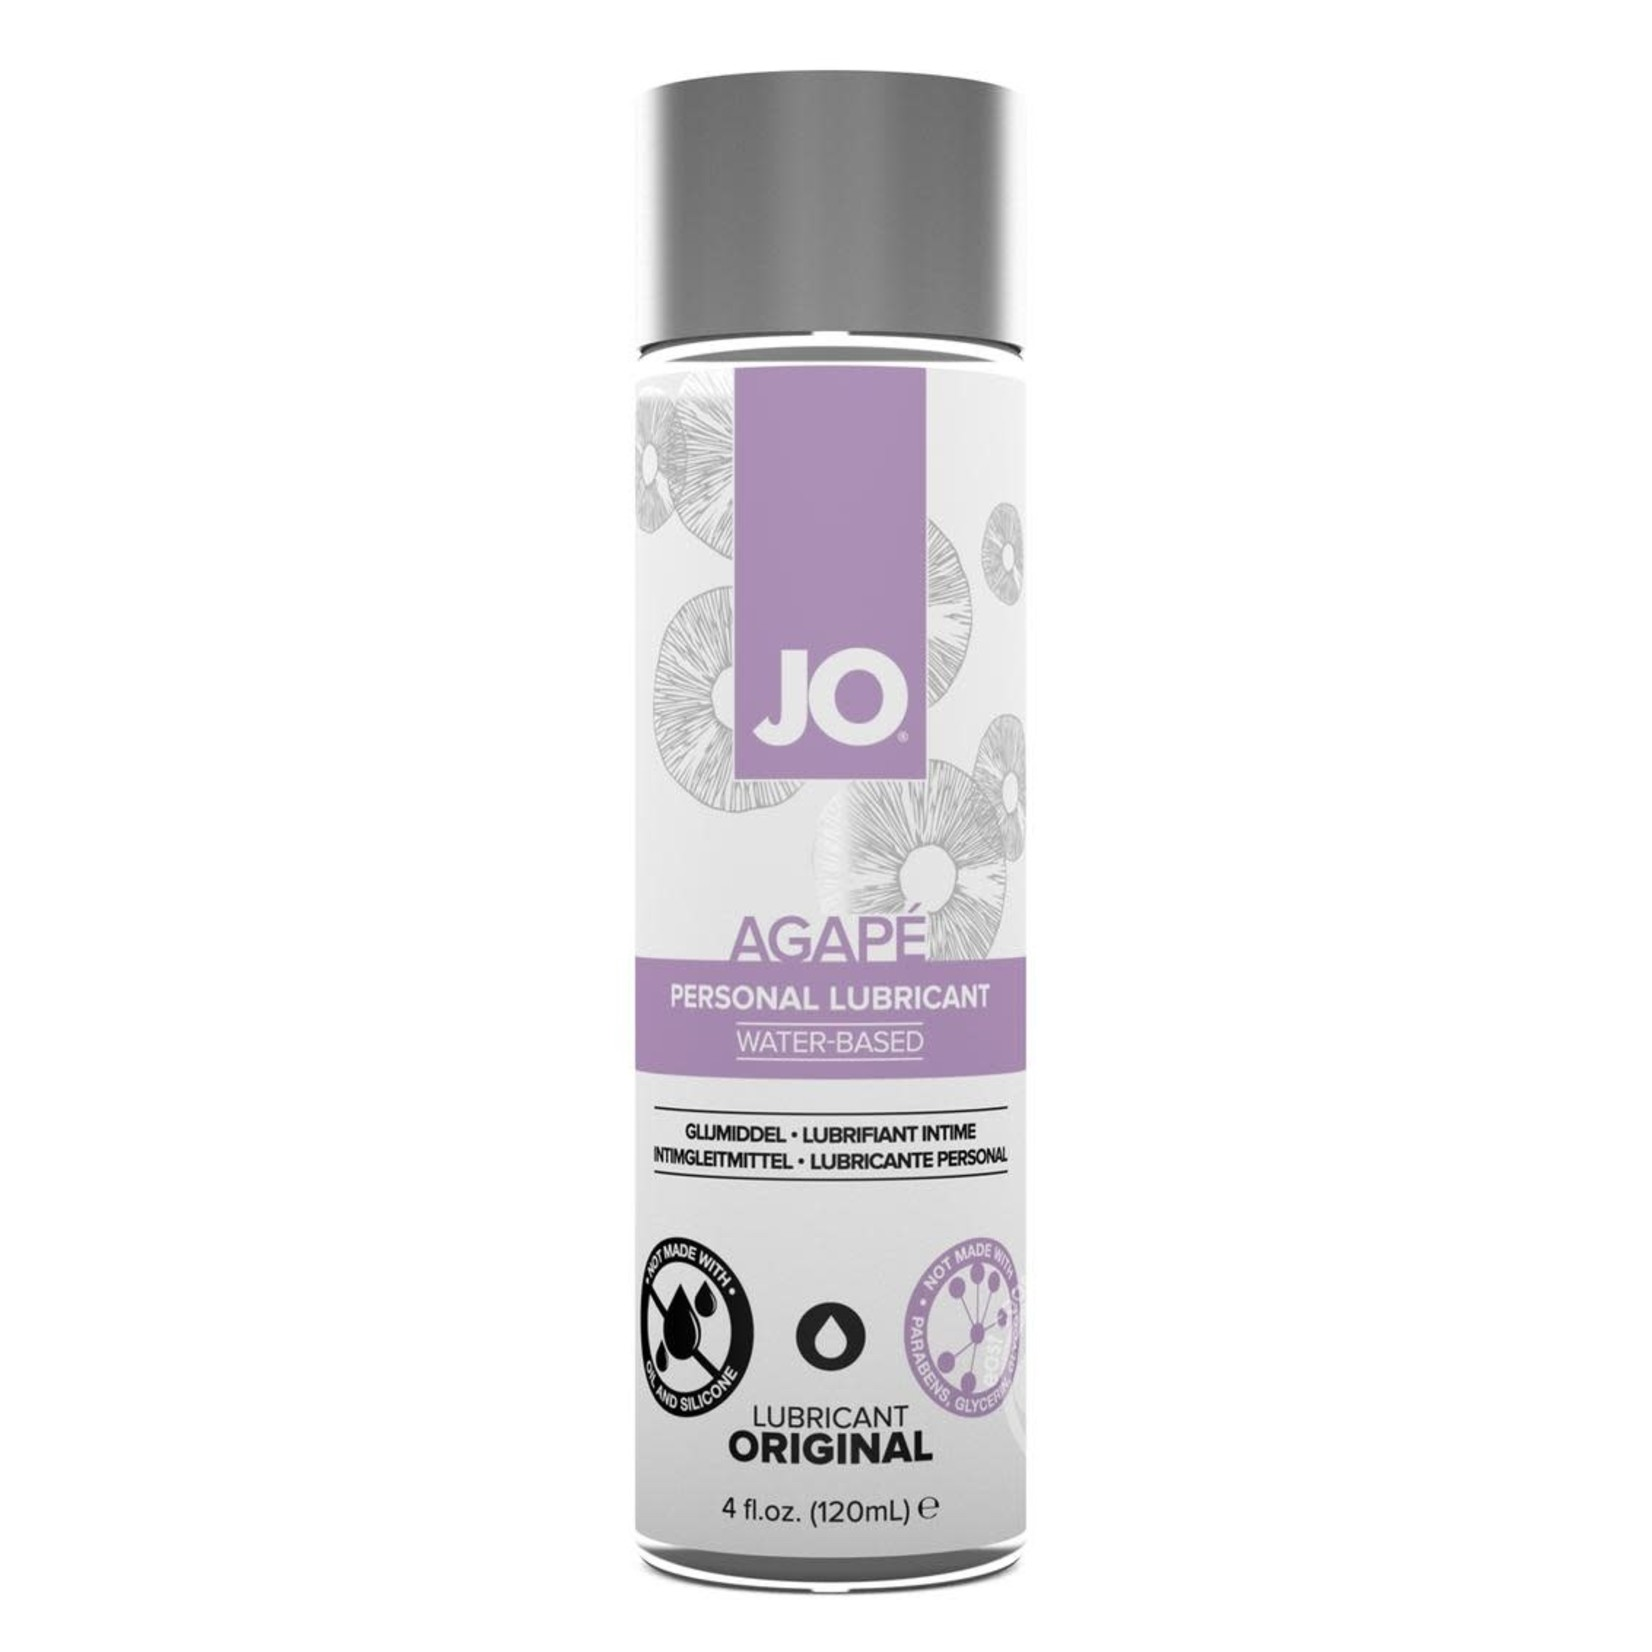 JO Agape Water Based Lubricant Original 4oz